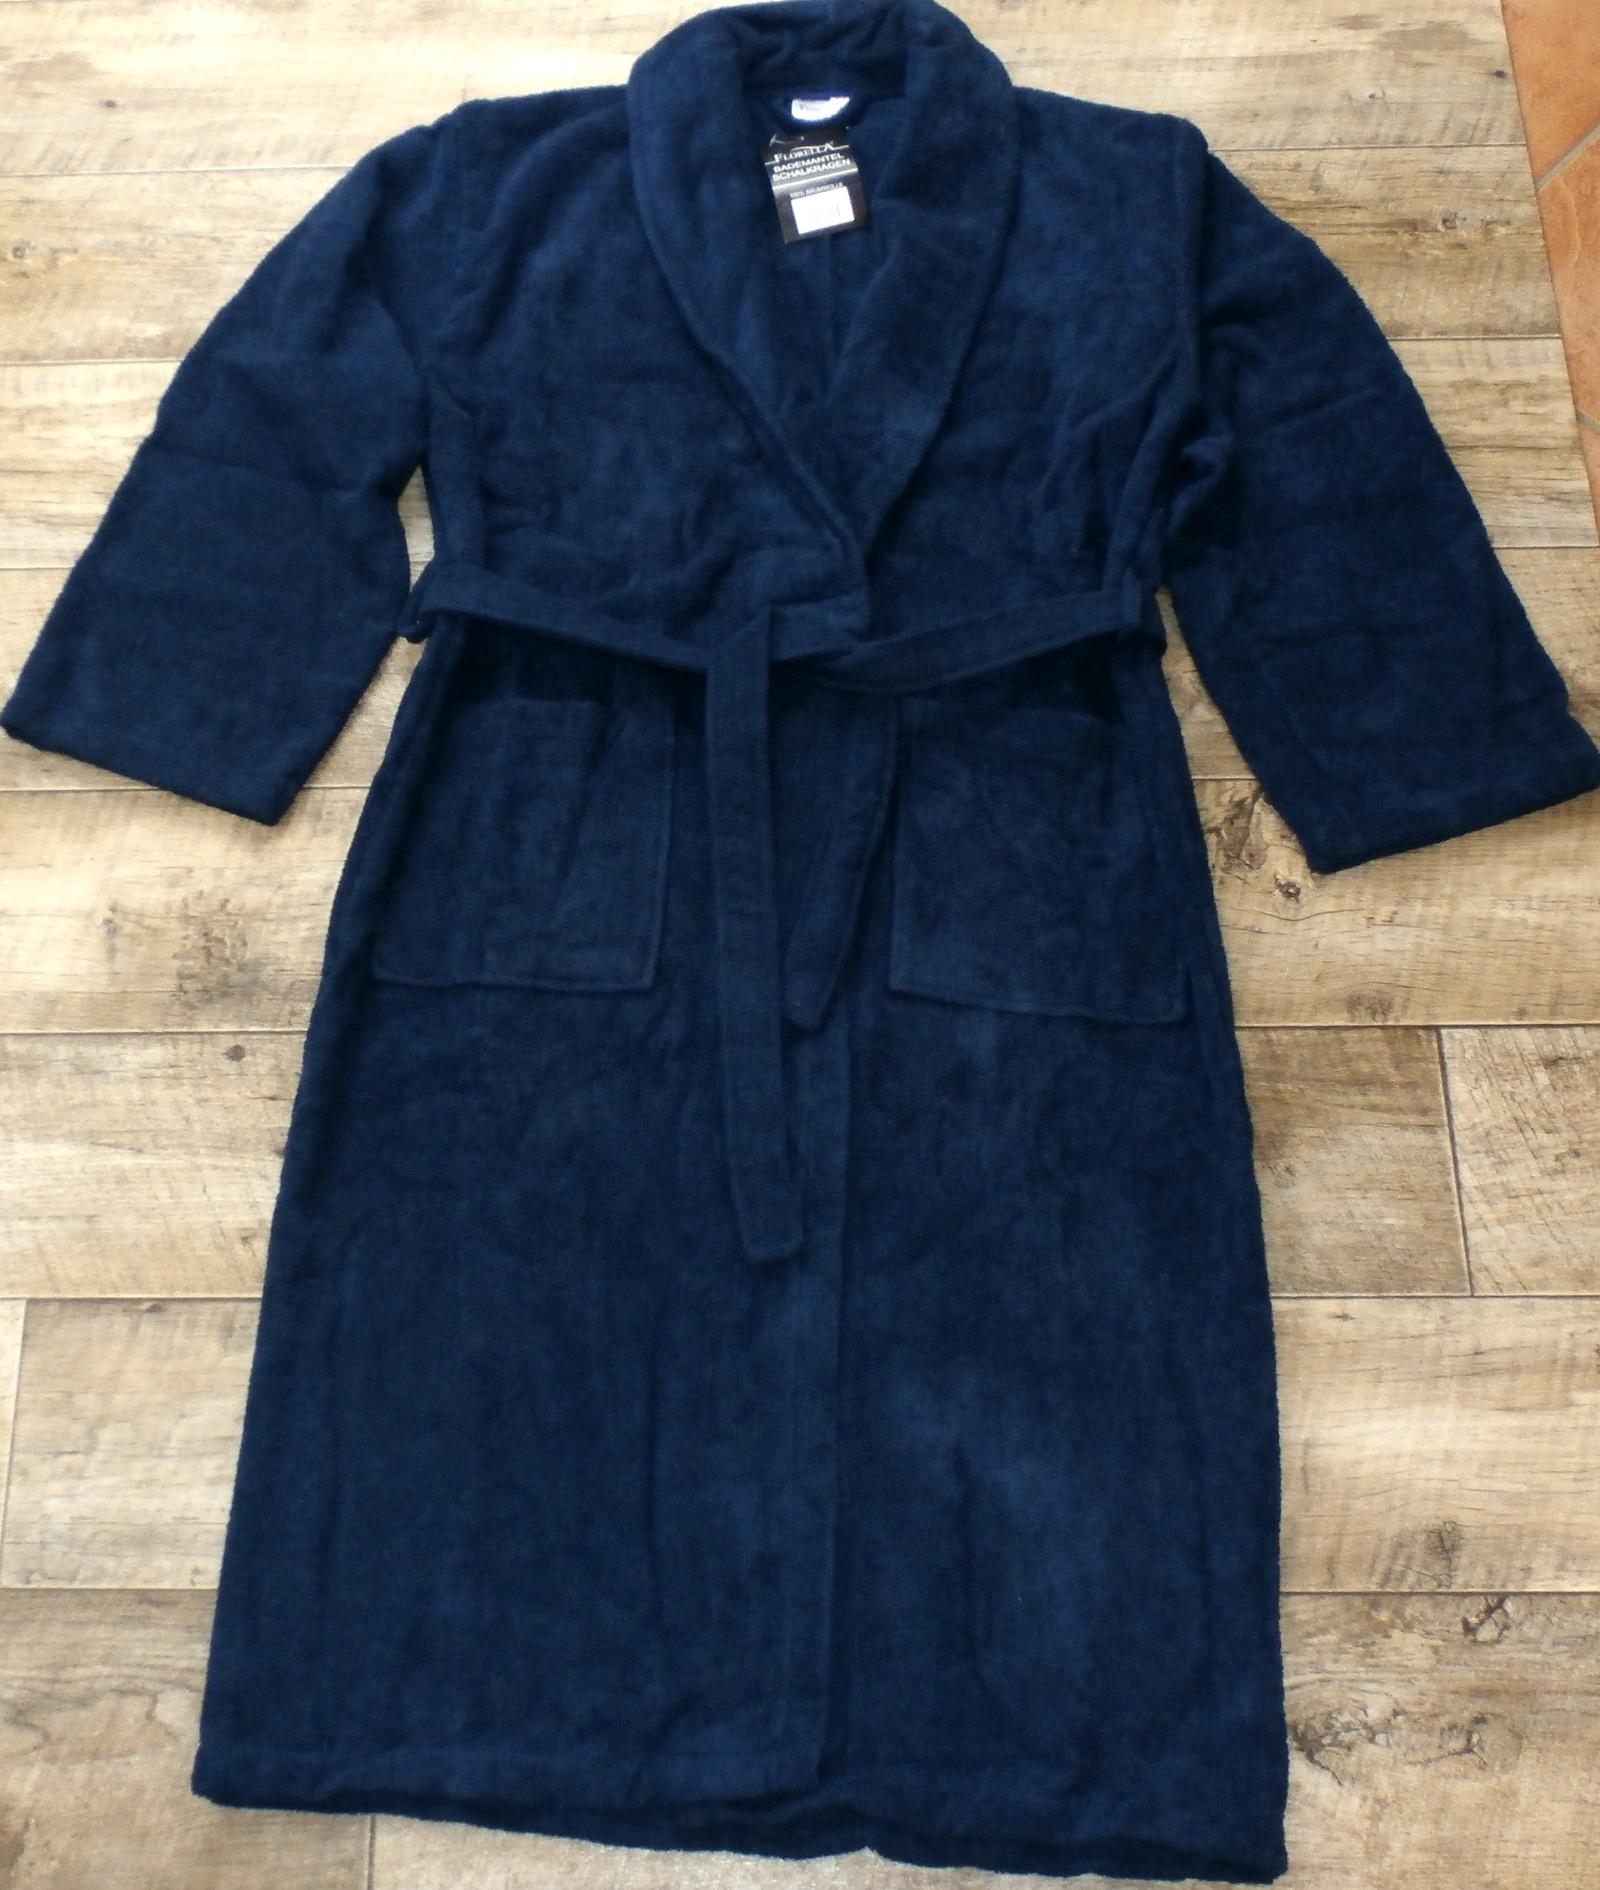 herren damen bademantel saunamantel hausmantel bade morgen mantel wei grau blau ebay. Black Bedroom Furniture Sets. Home Design Ideas